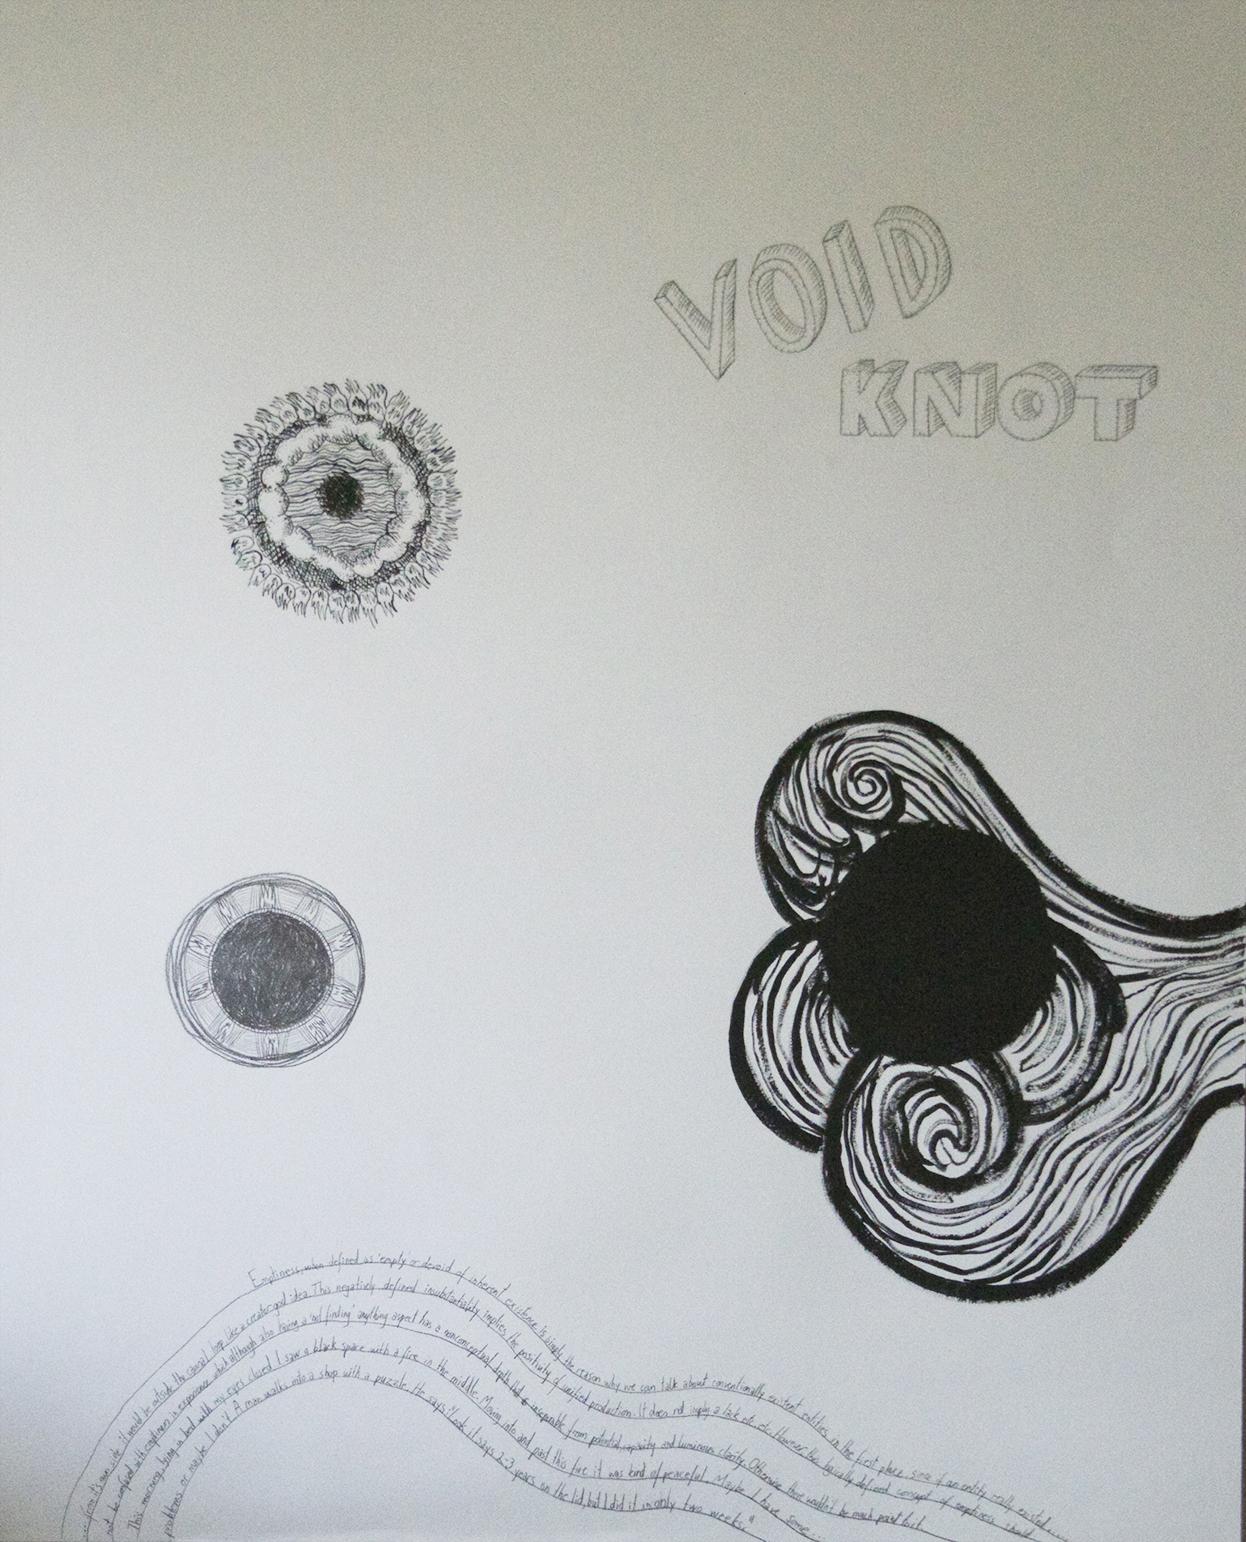 Void Knot